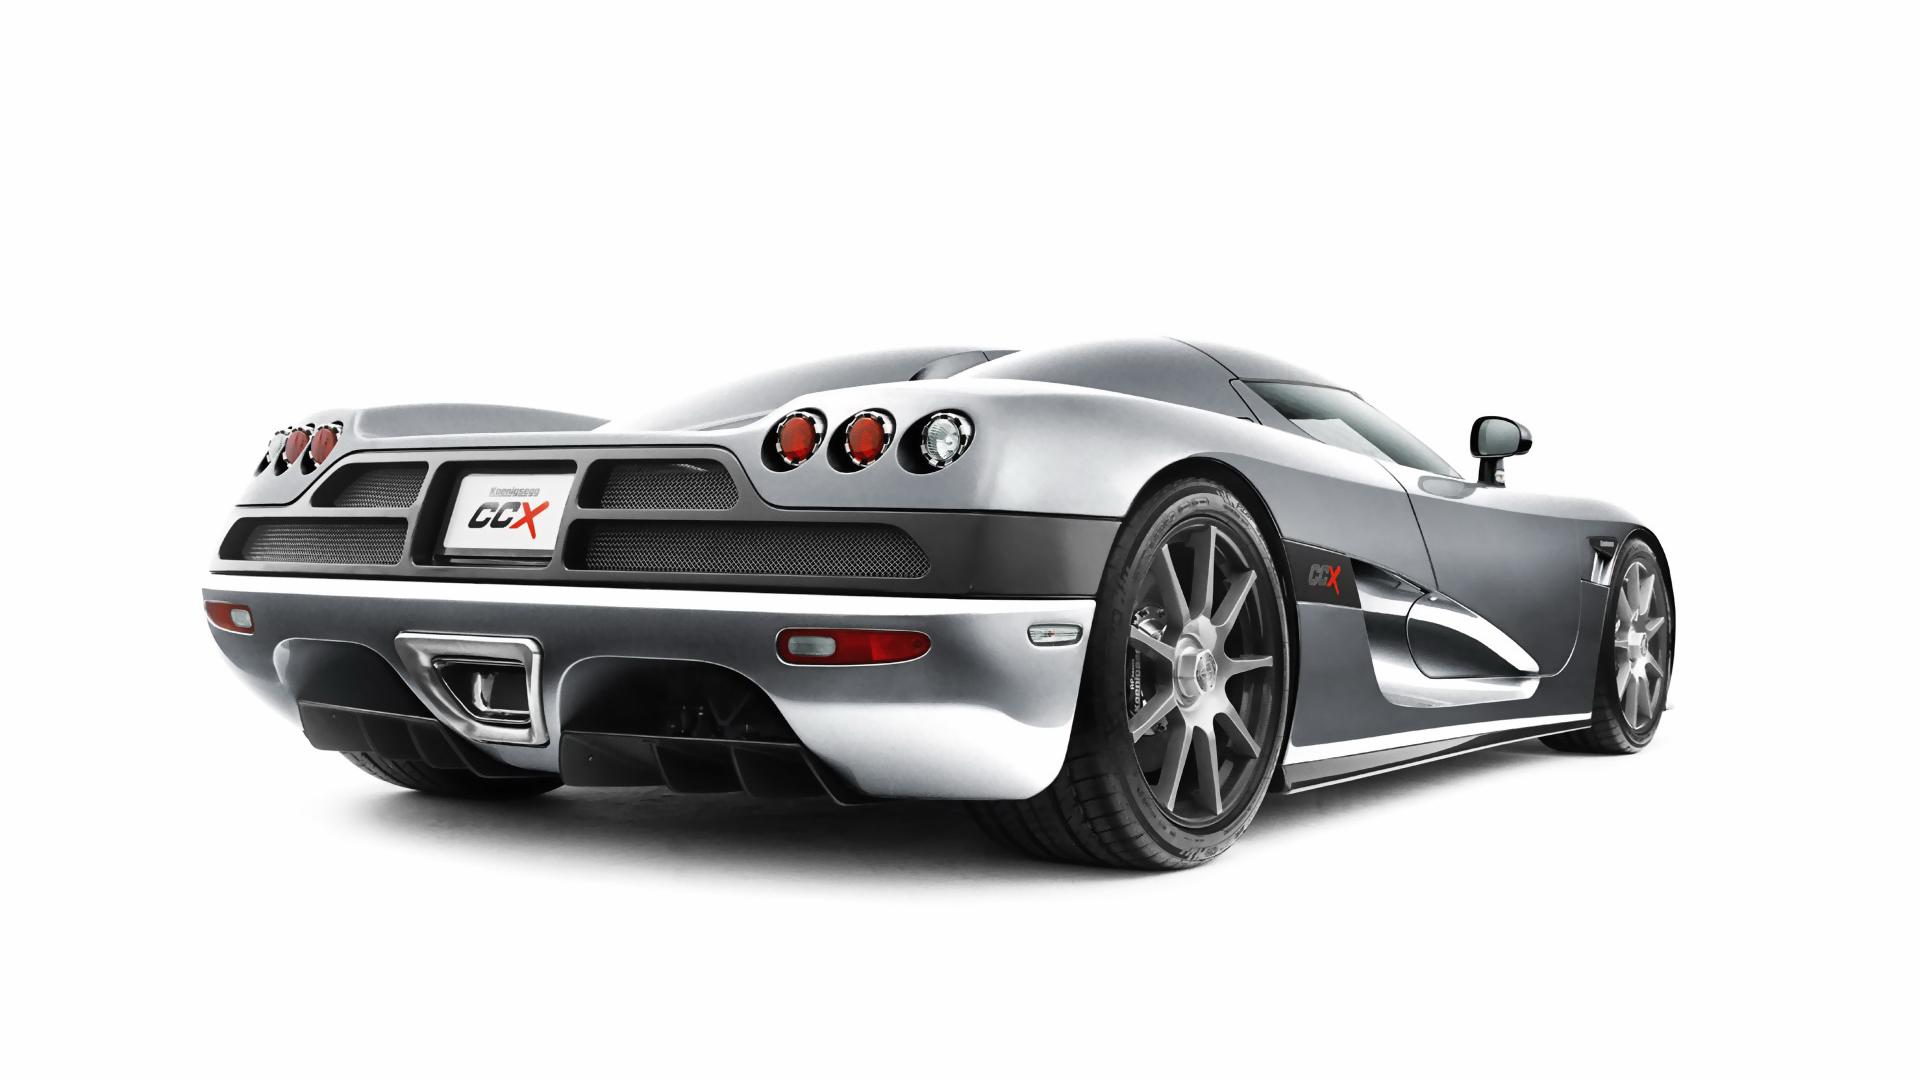 Cool Car Wallpaper-1080p Free HD Resolutions | Car Wallpapers